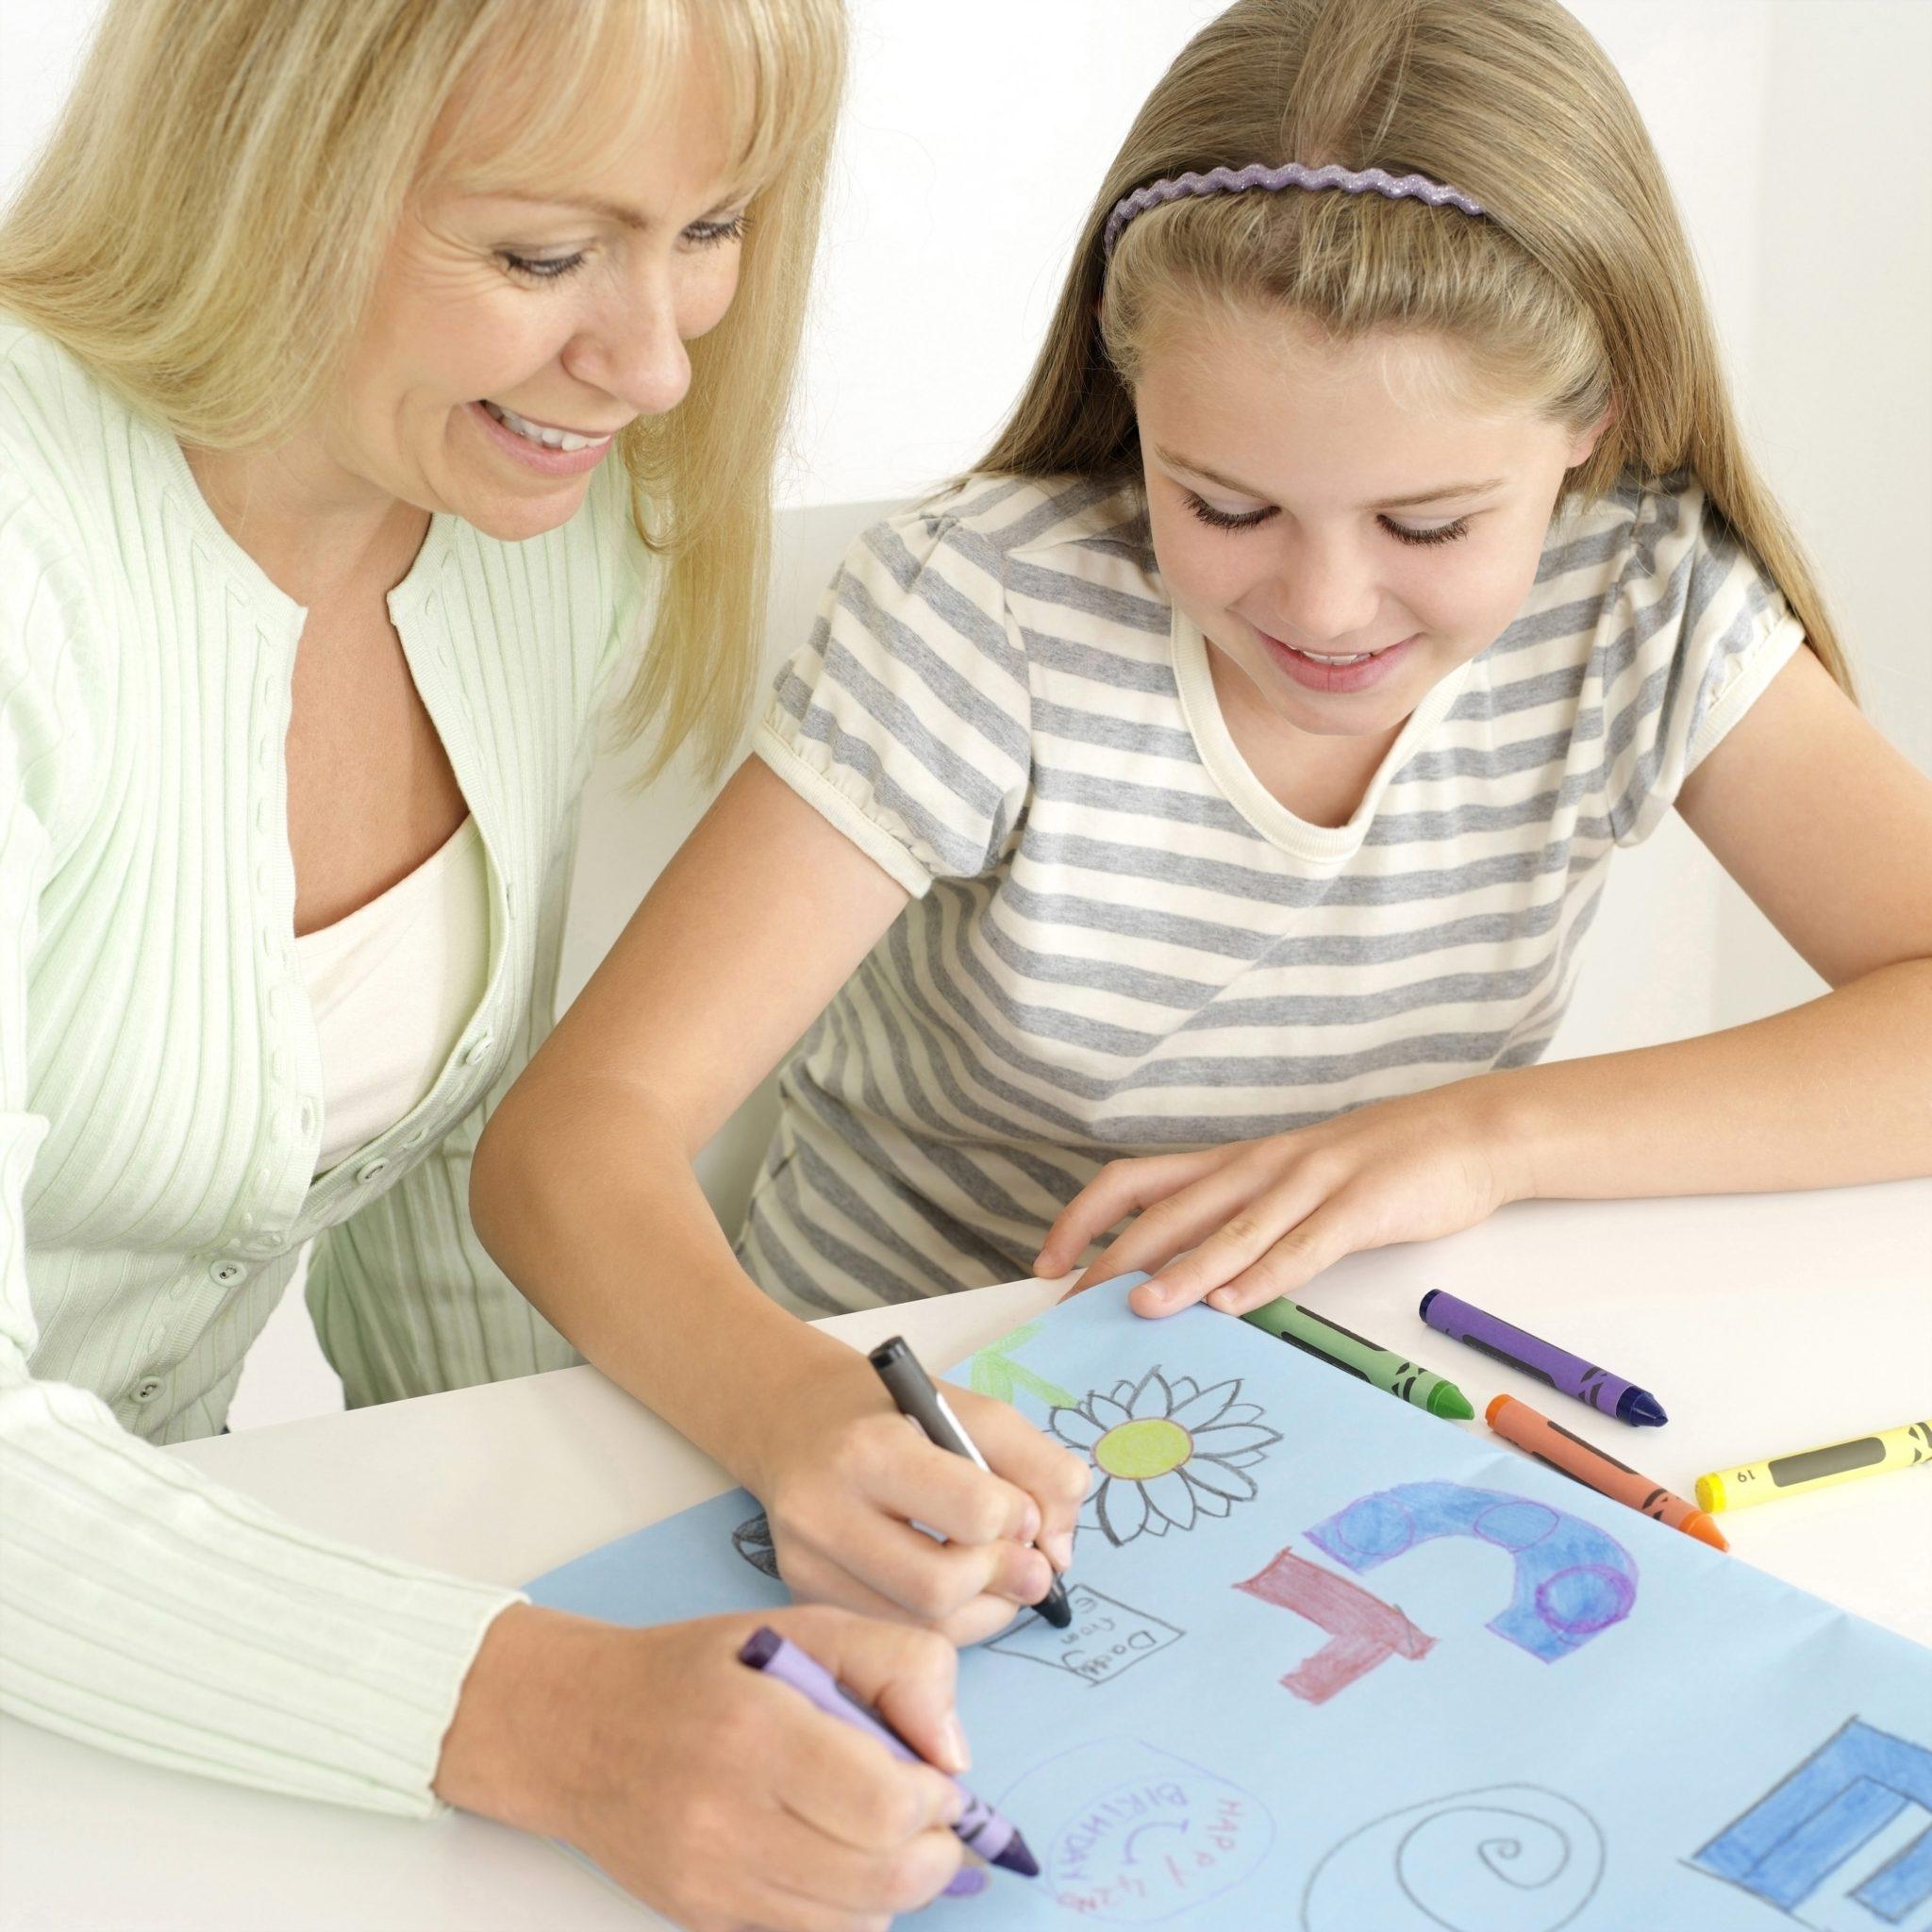 The Purple Crayon - Encouraging Creativity in your Children